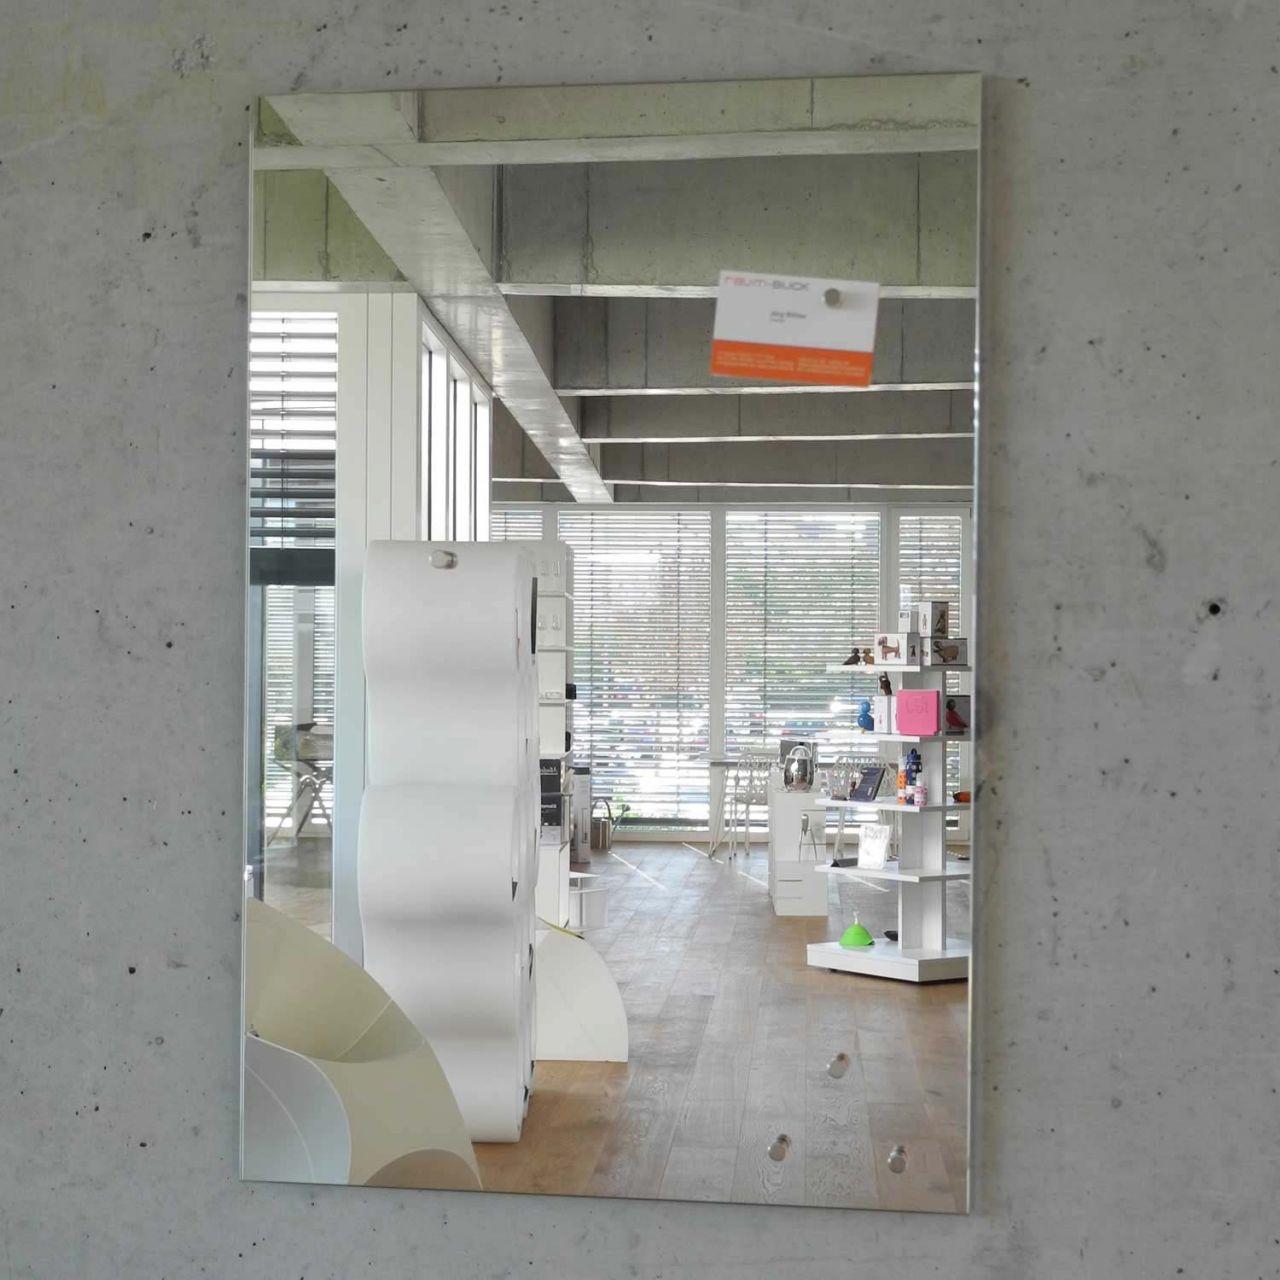 raum-blick Spiegel Magnetwand MAX 60x40 cm M10-SP-2